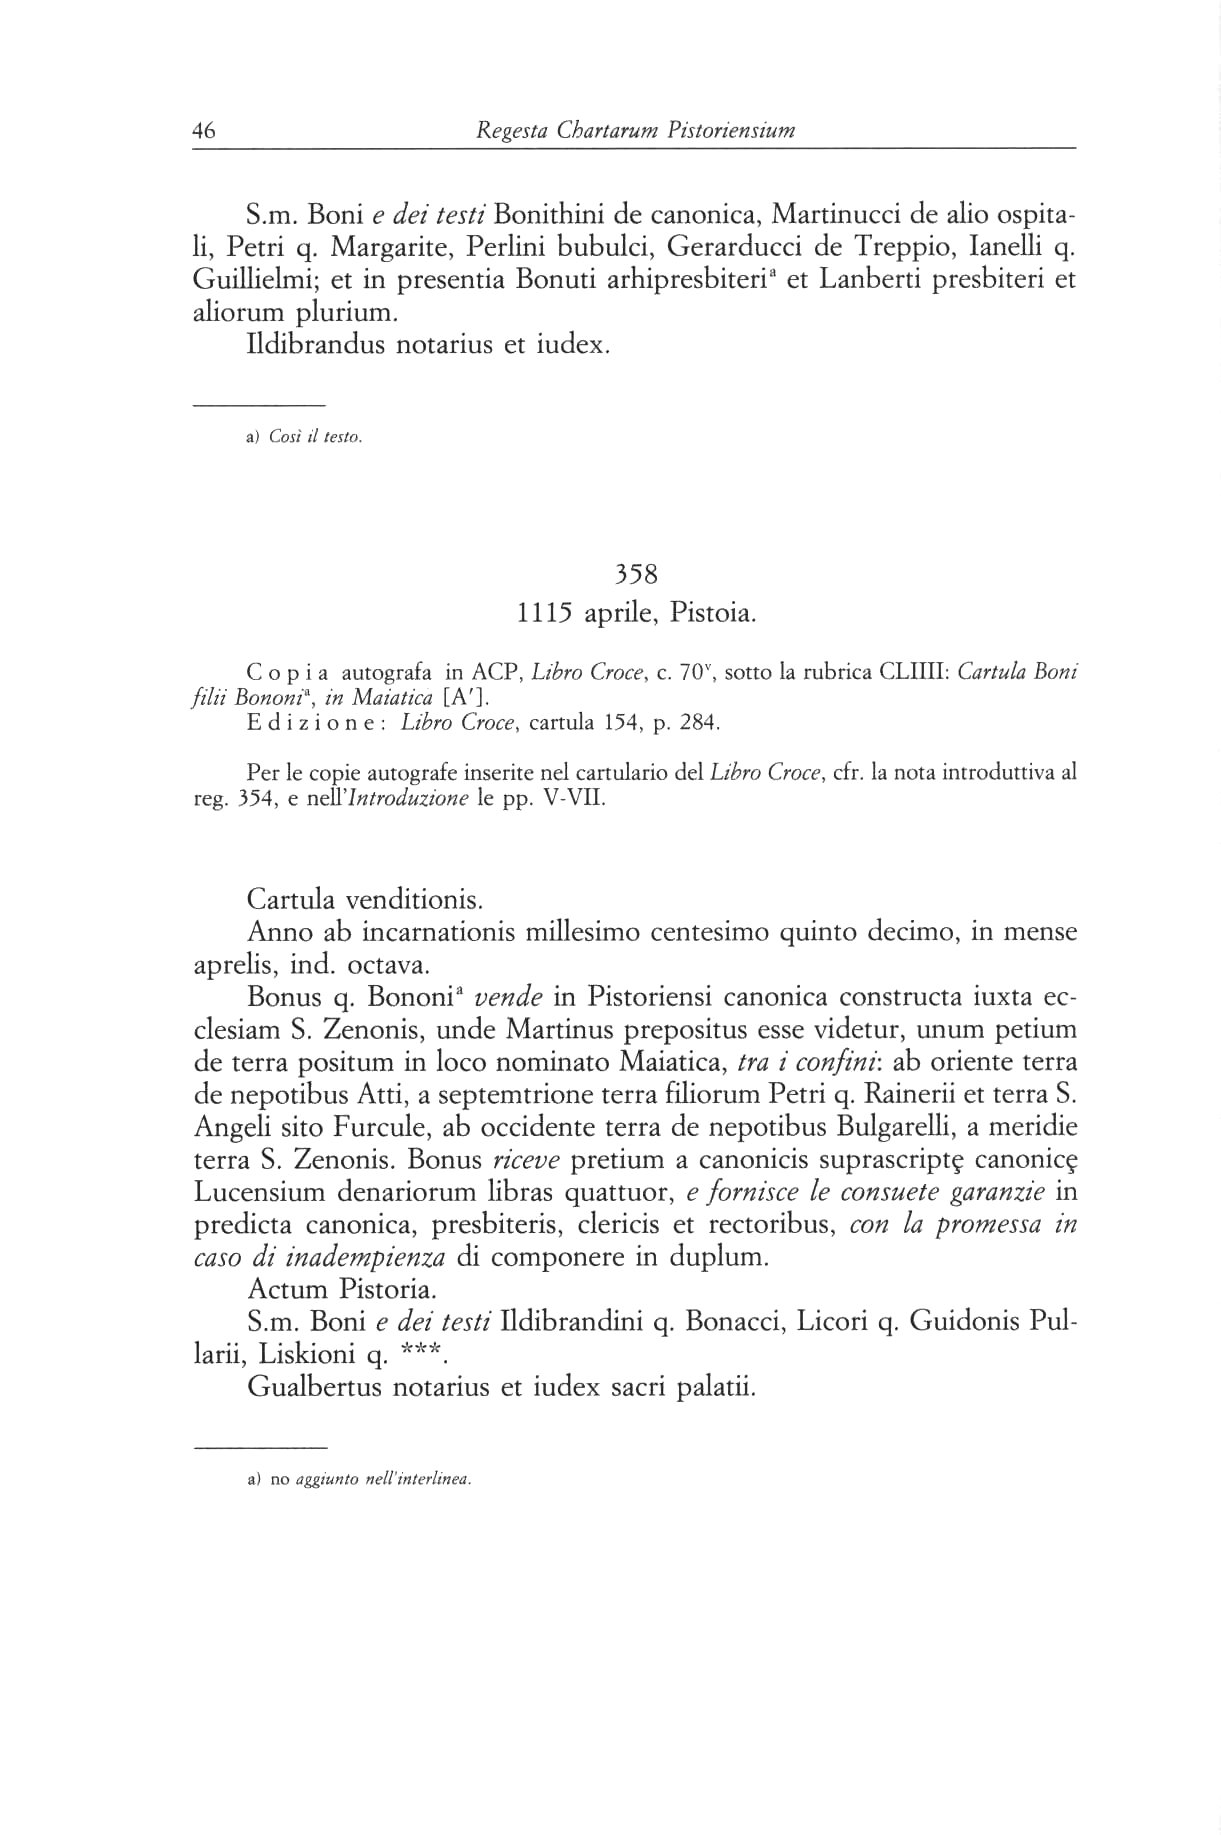 Canonica S. Zenone XII 0046.jpg